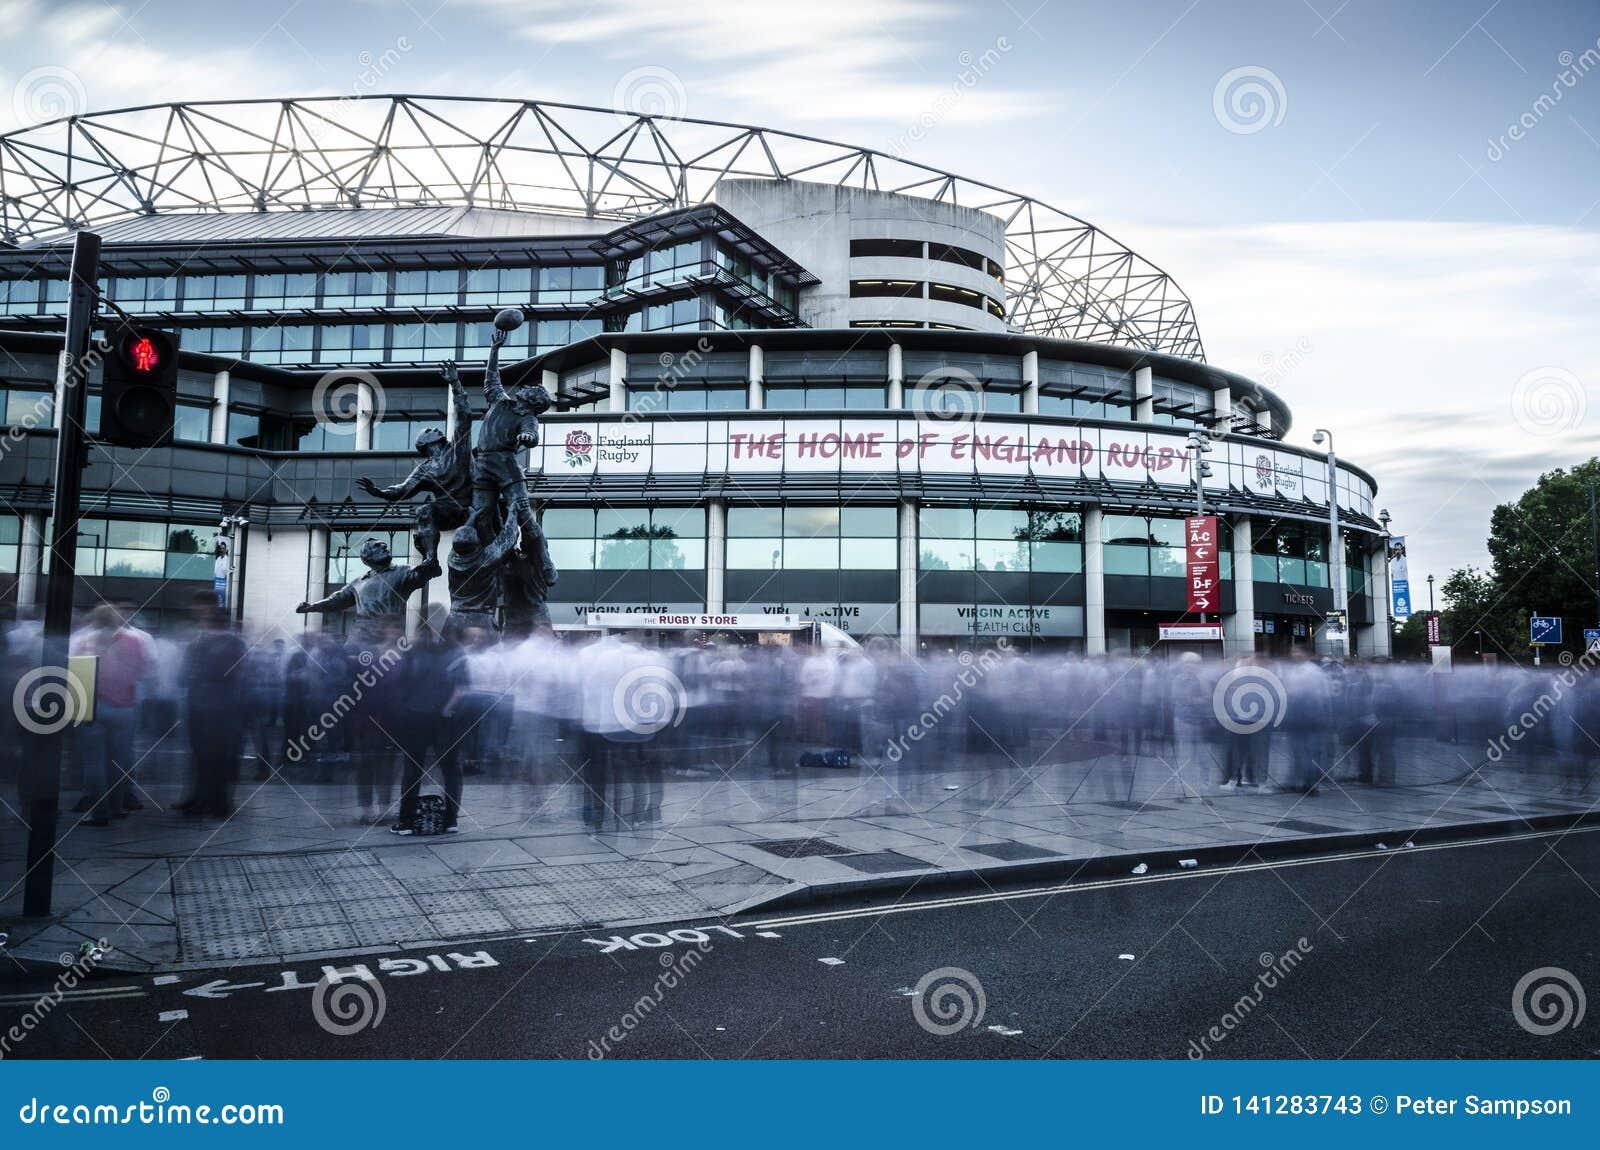 Fans am Twickenham Stadium